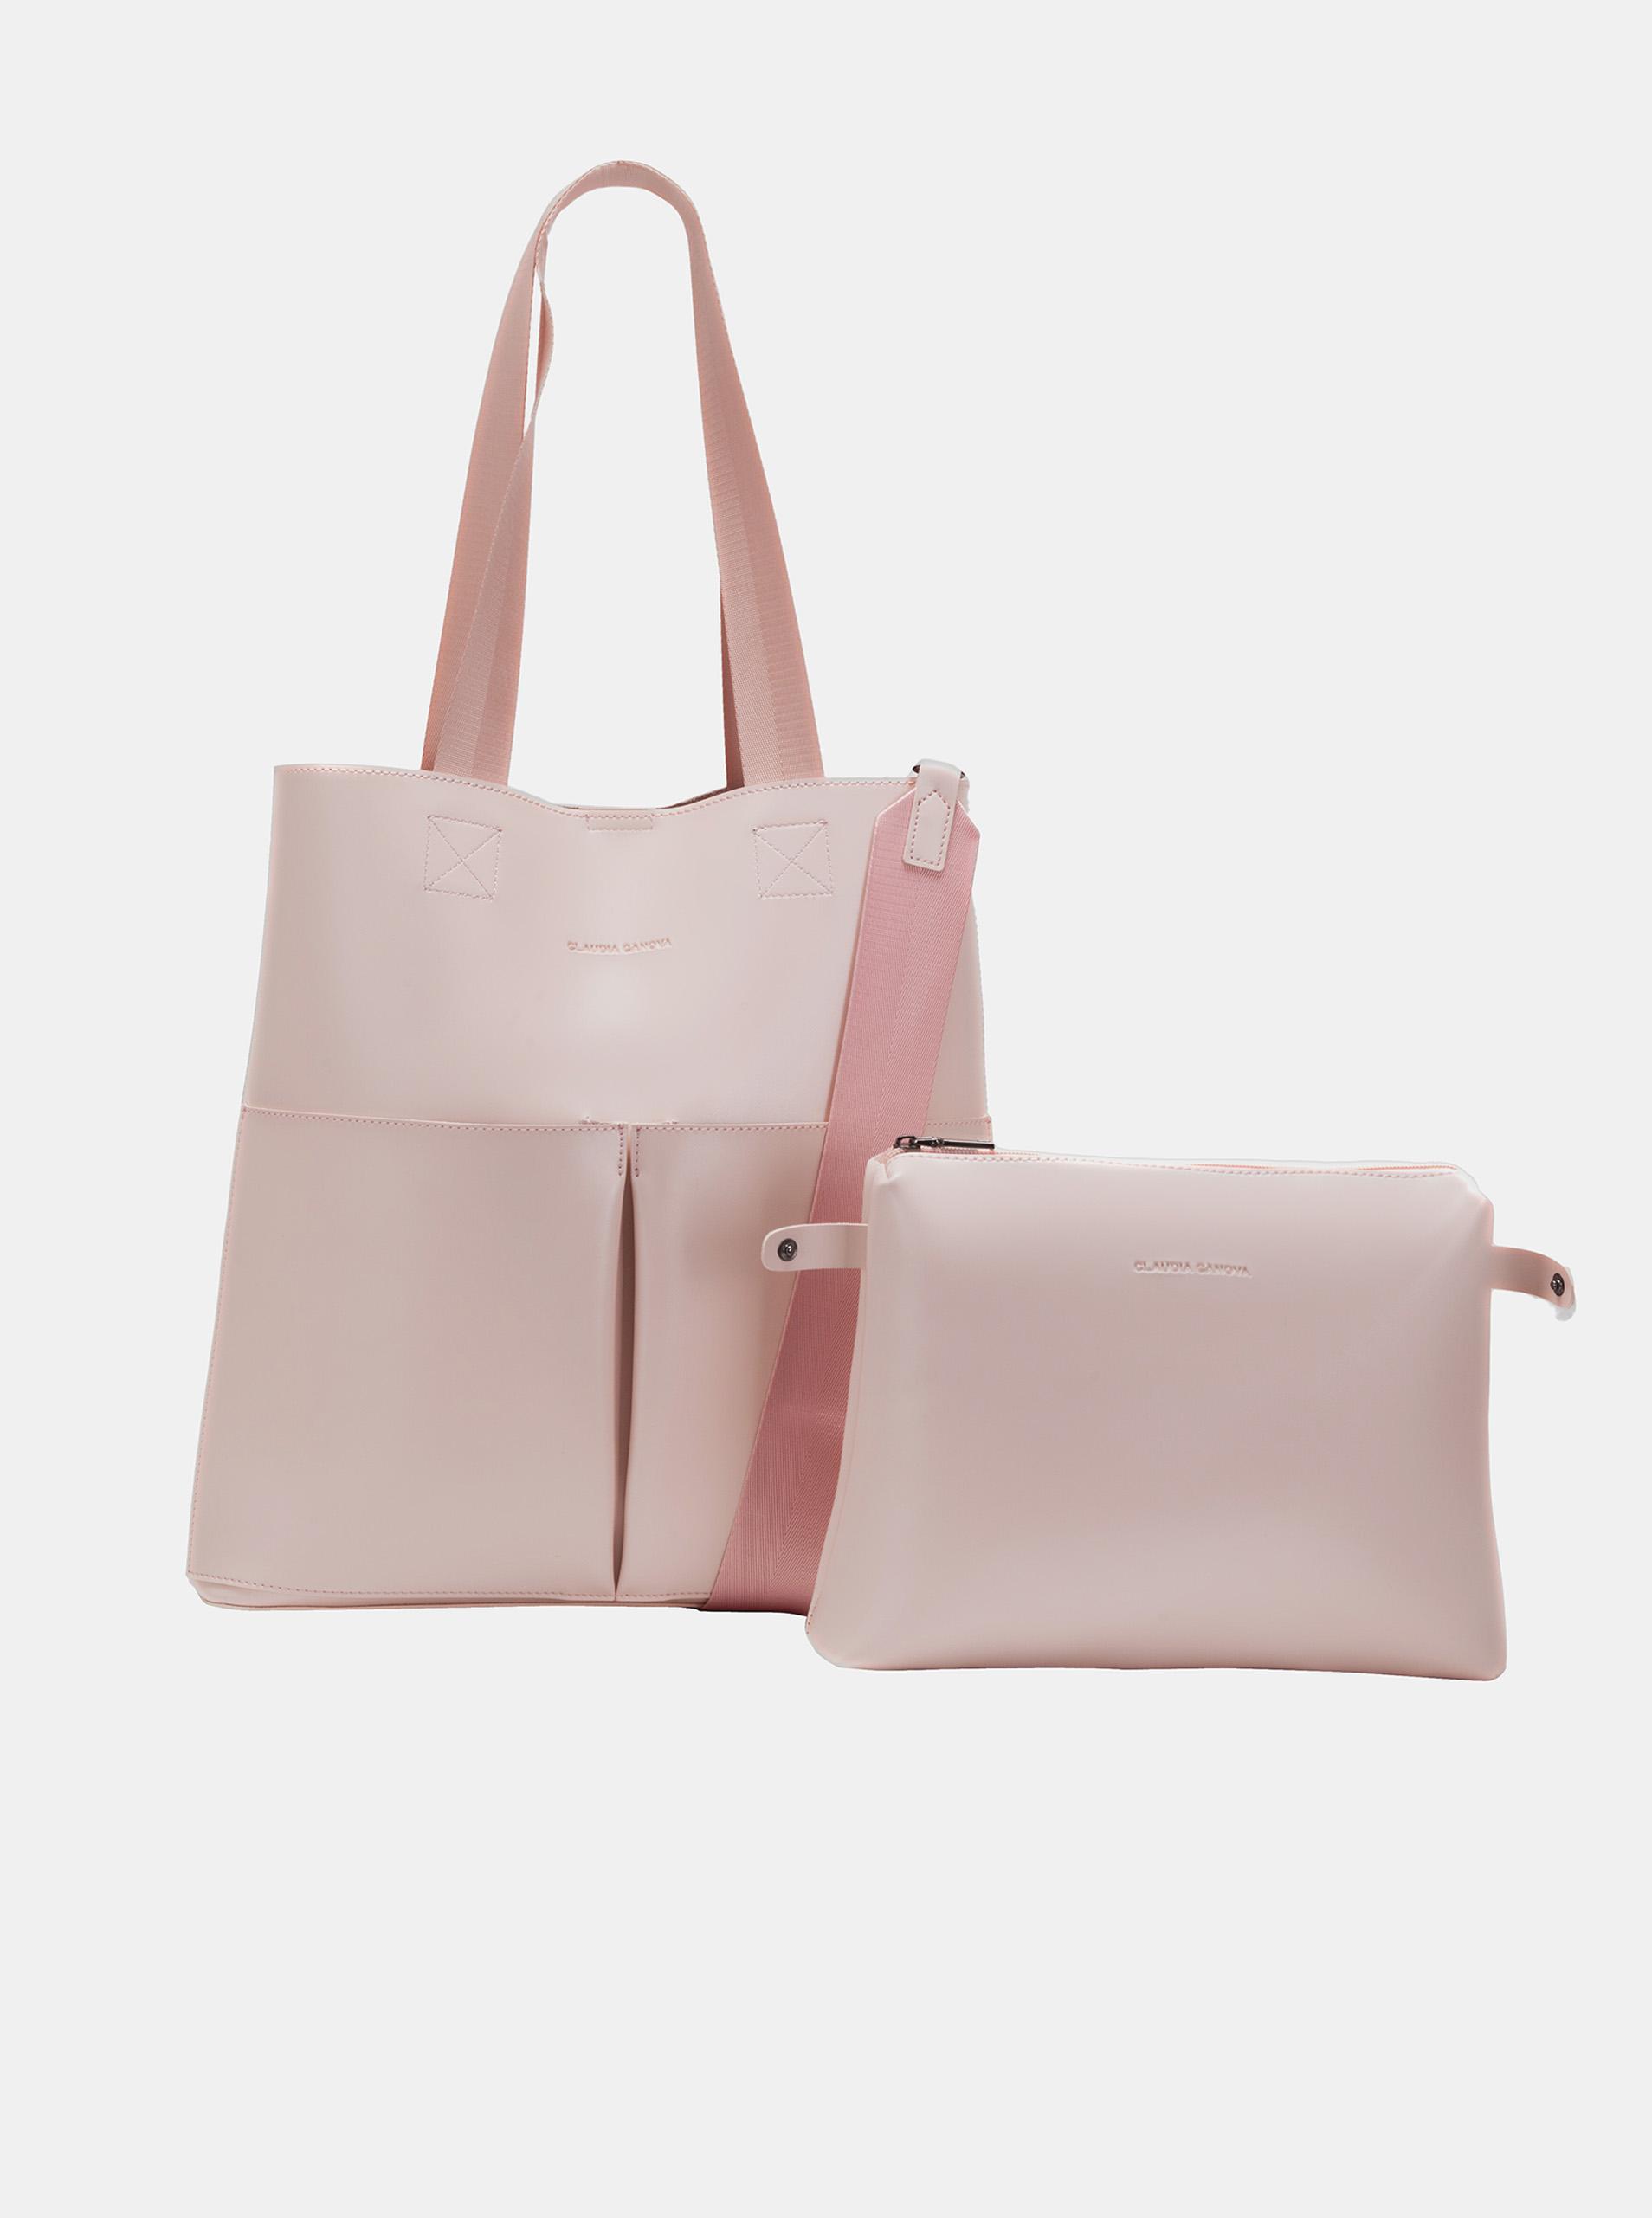 Claudia Canova roz geanta